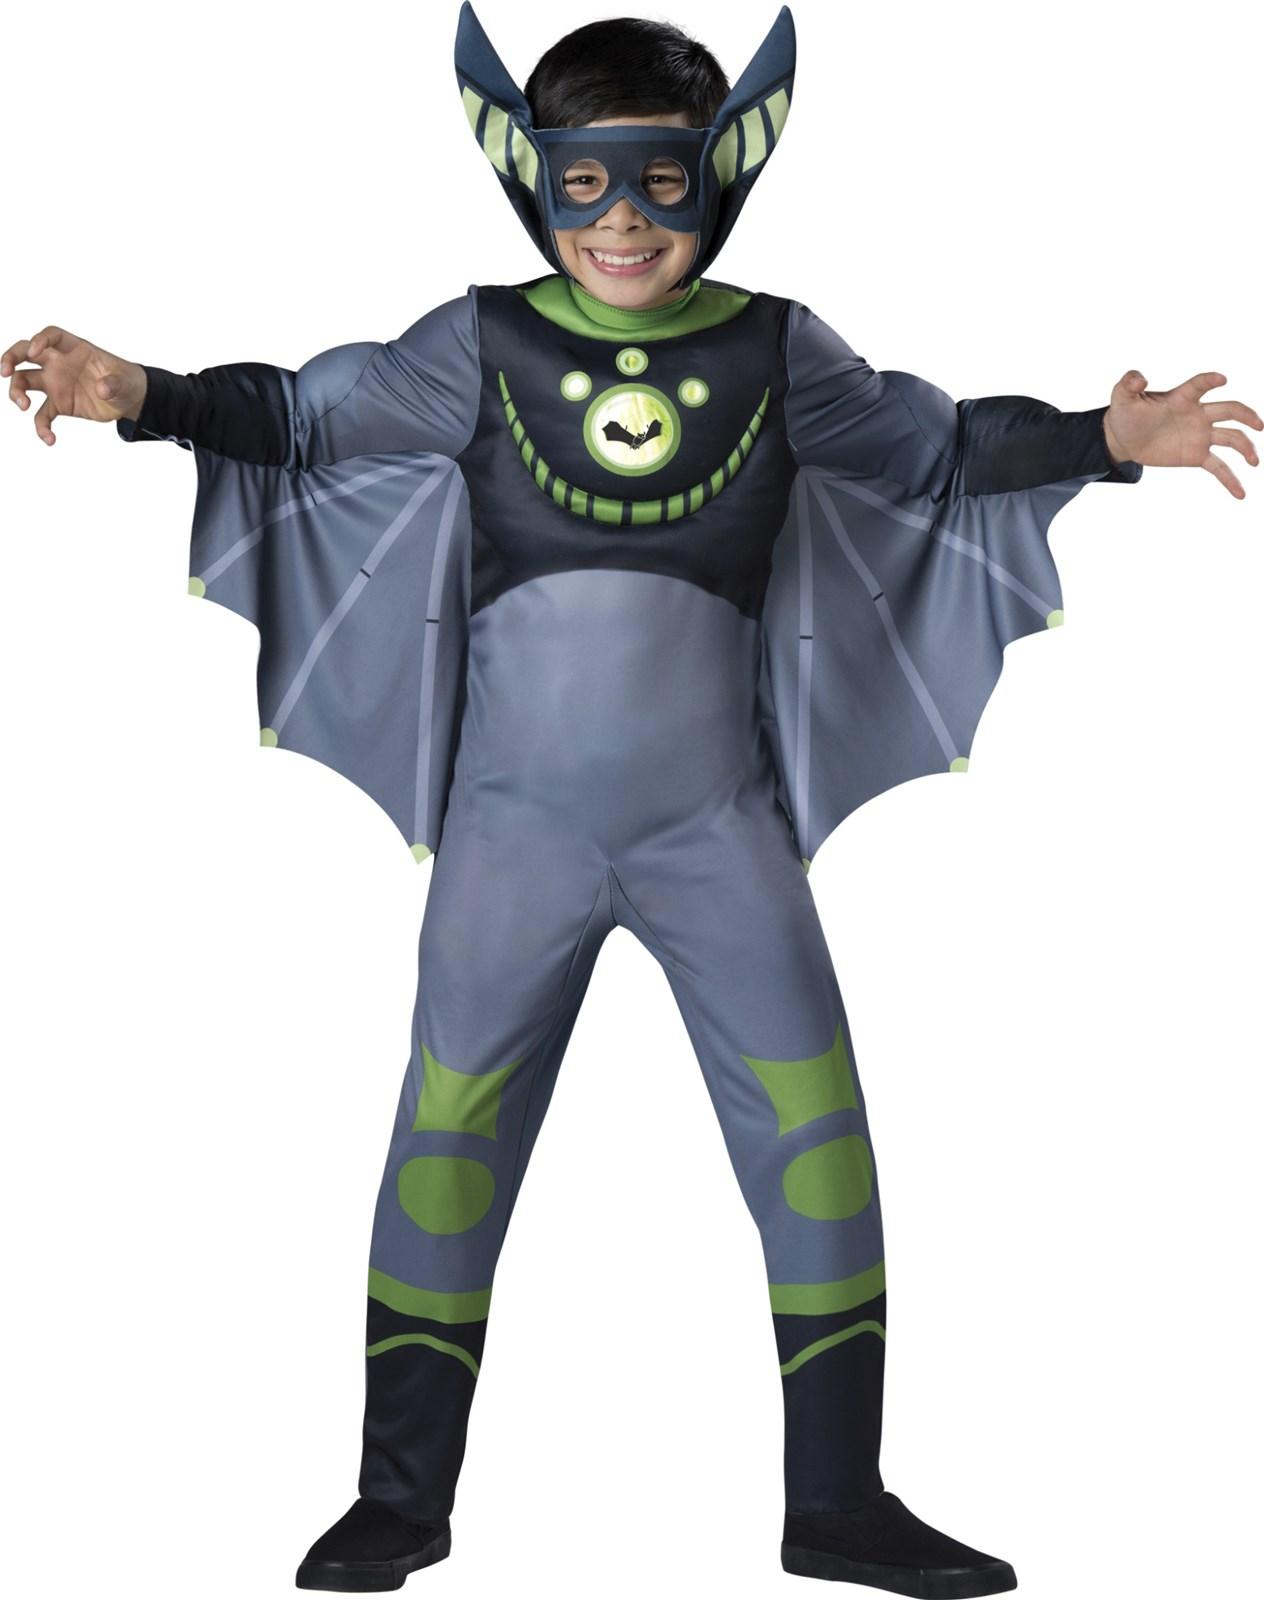 Wild Kratts Quality Bat Green Costume For Kids